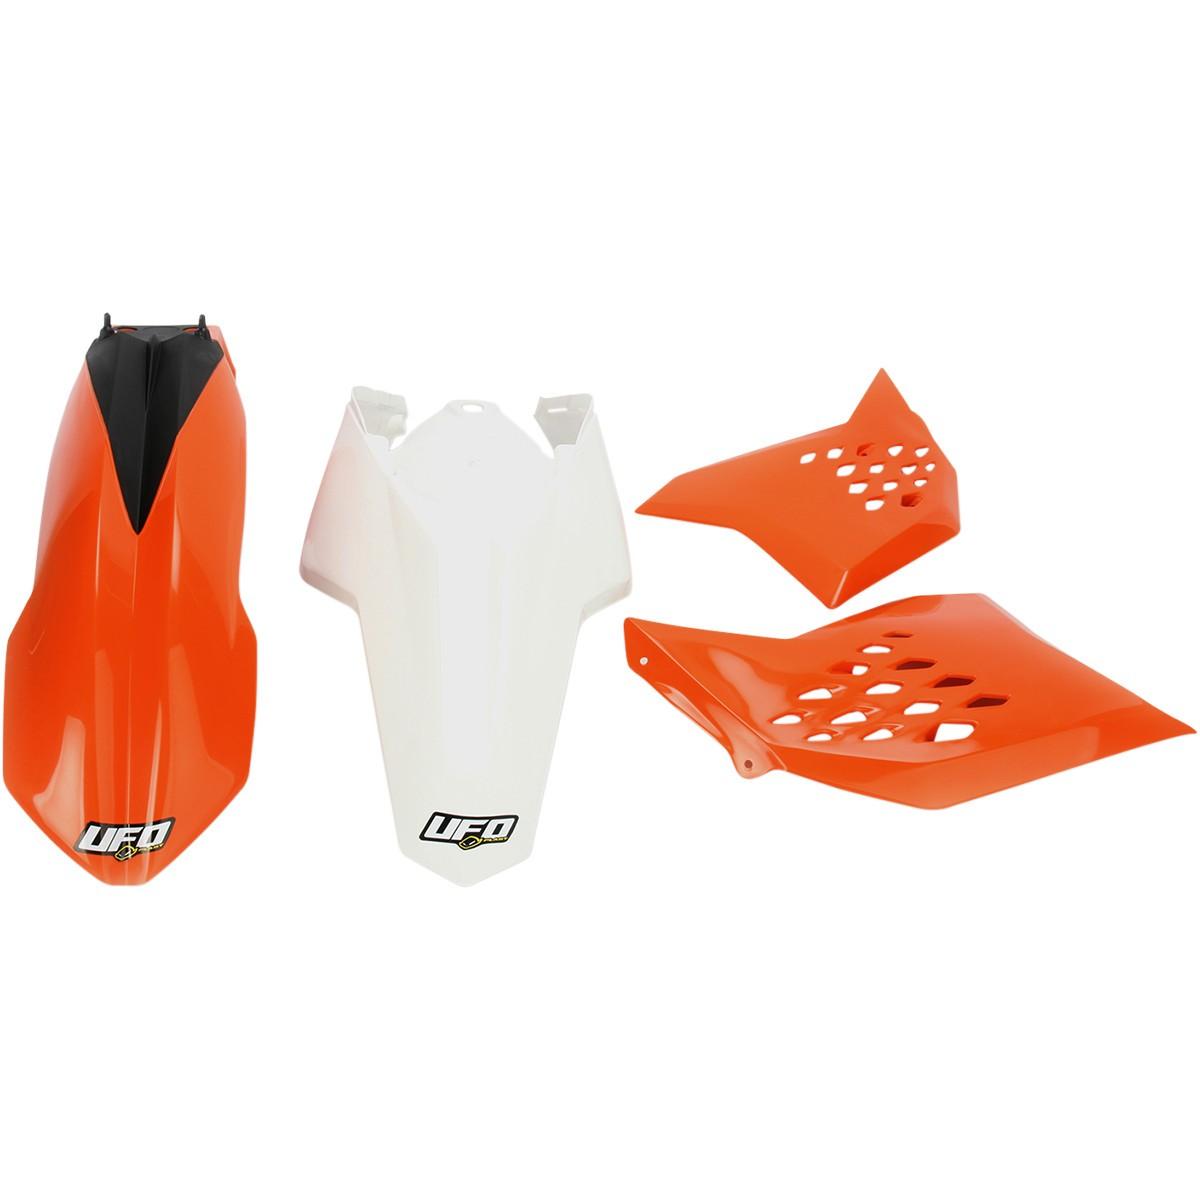 UFO Complete Body Kit OEM - KTKIT512-999